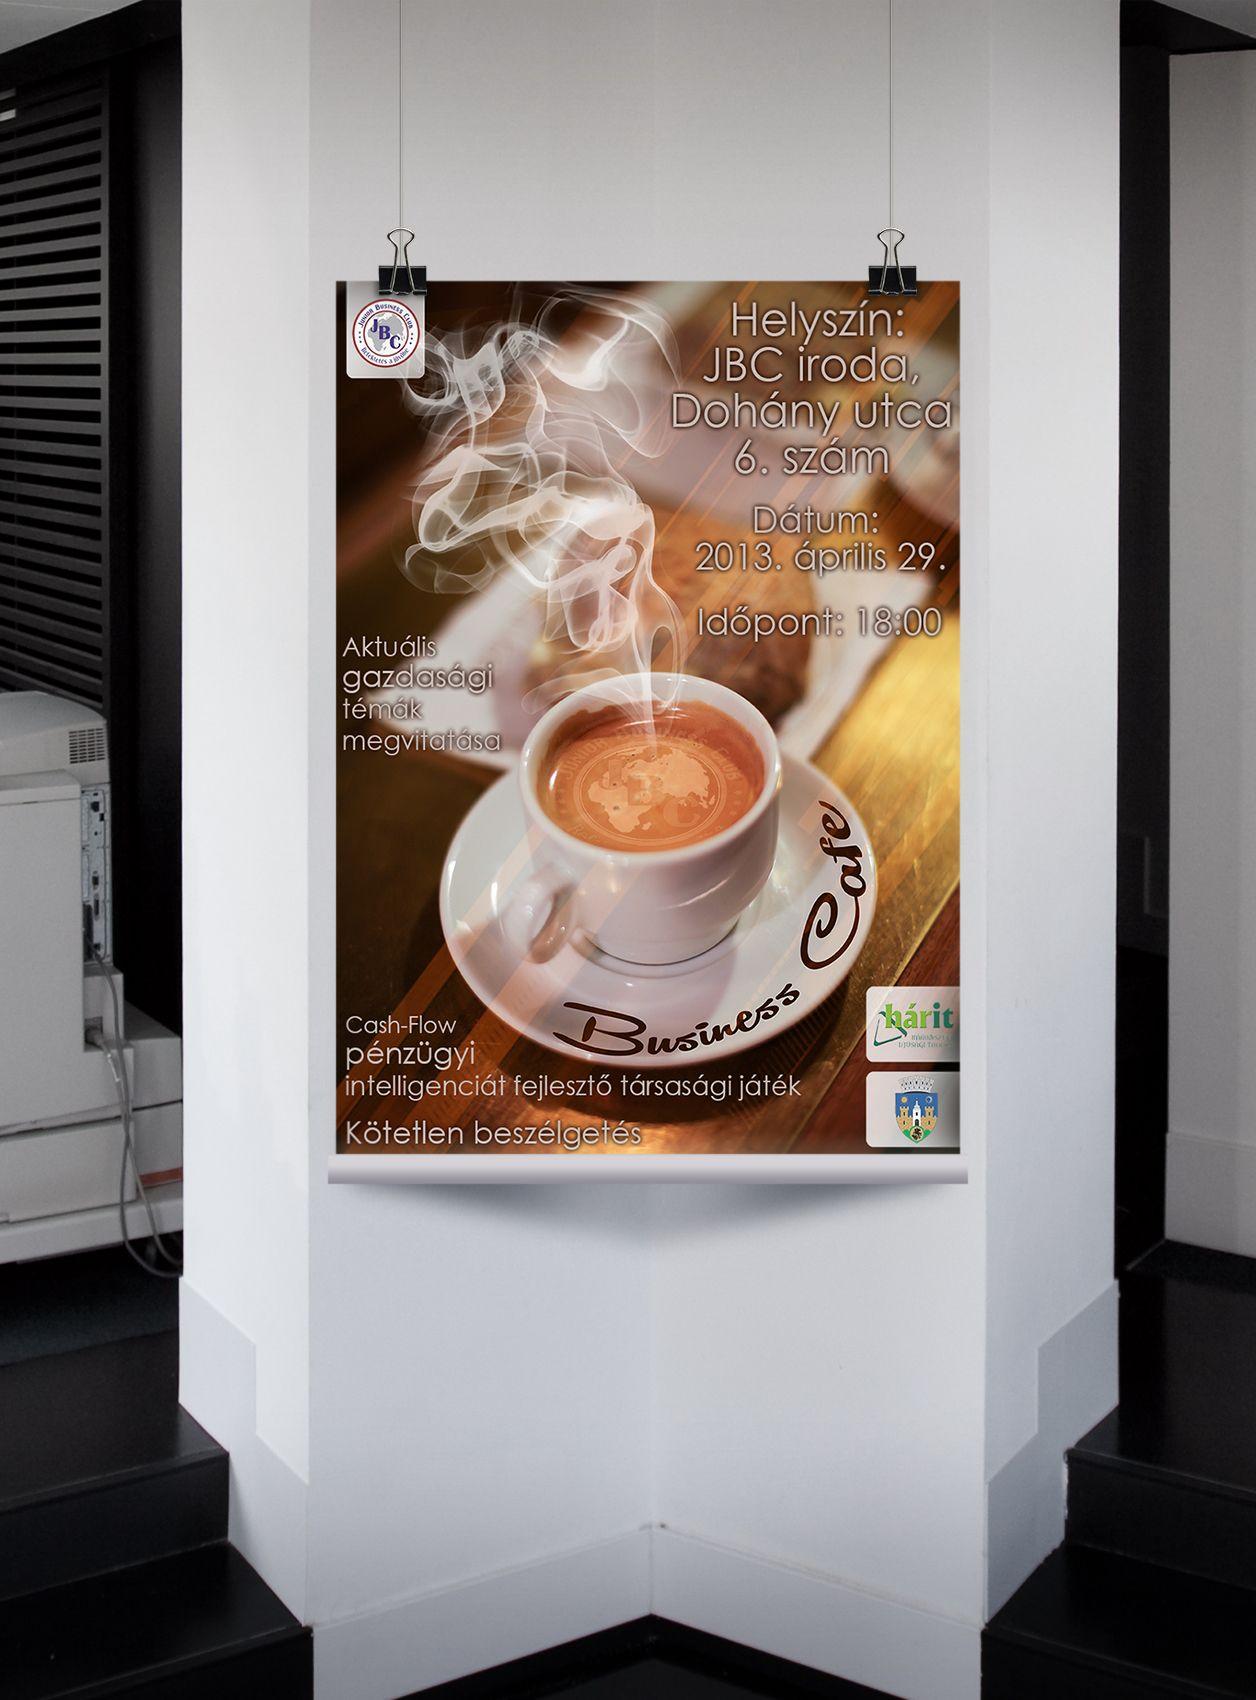 Business Cafe Event Poster for Junior Business Club